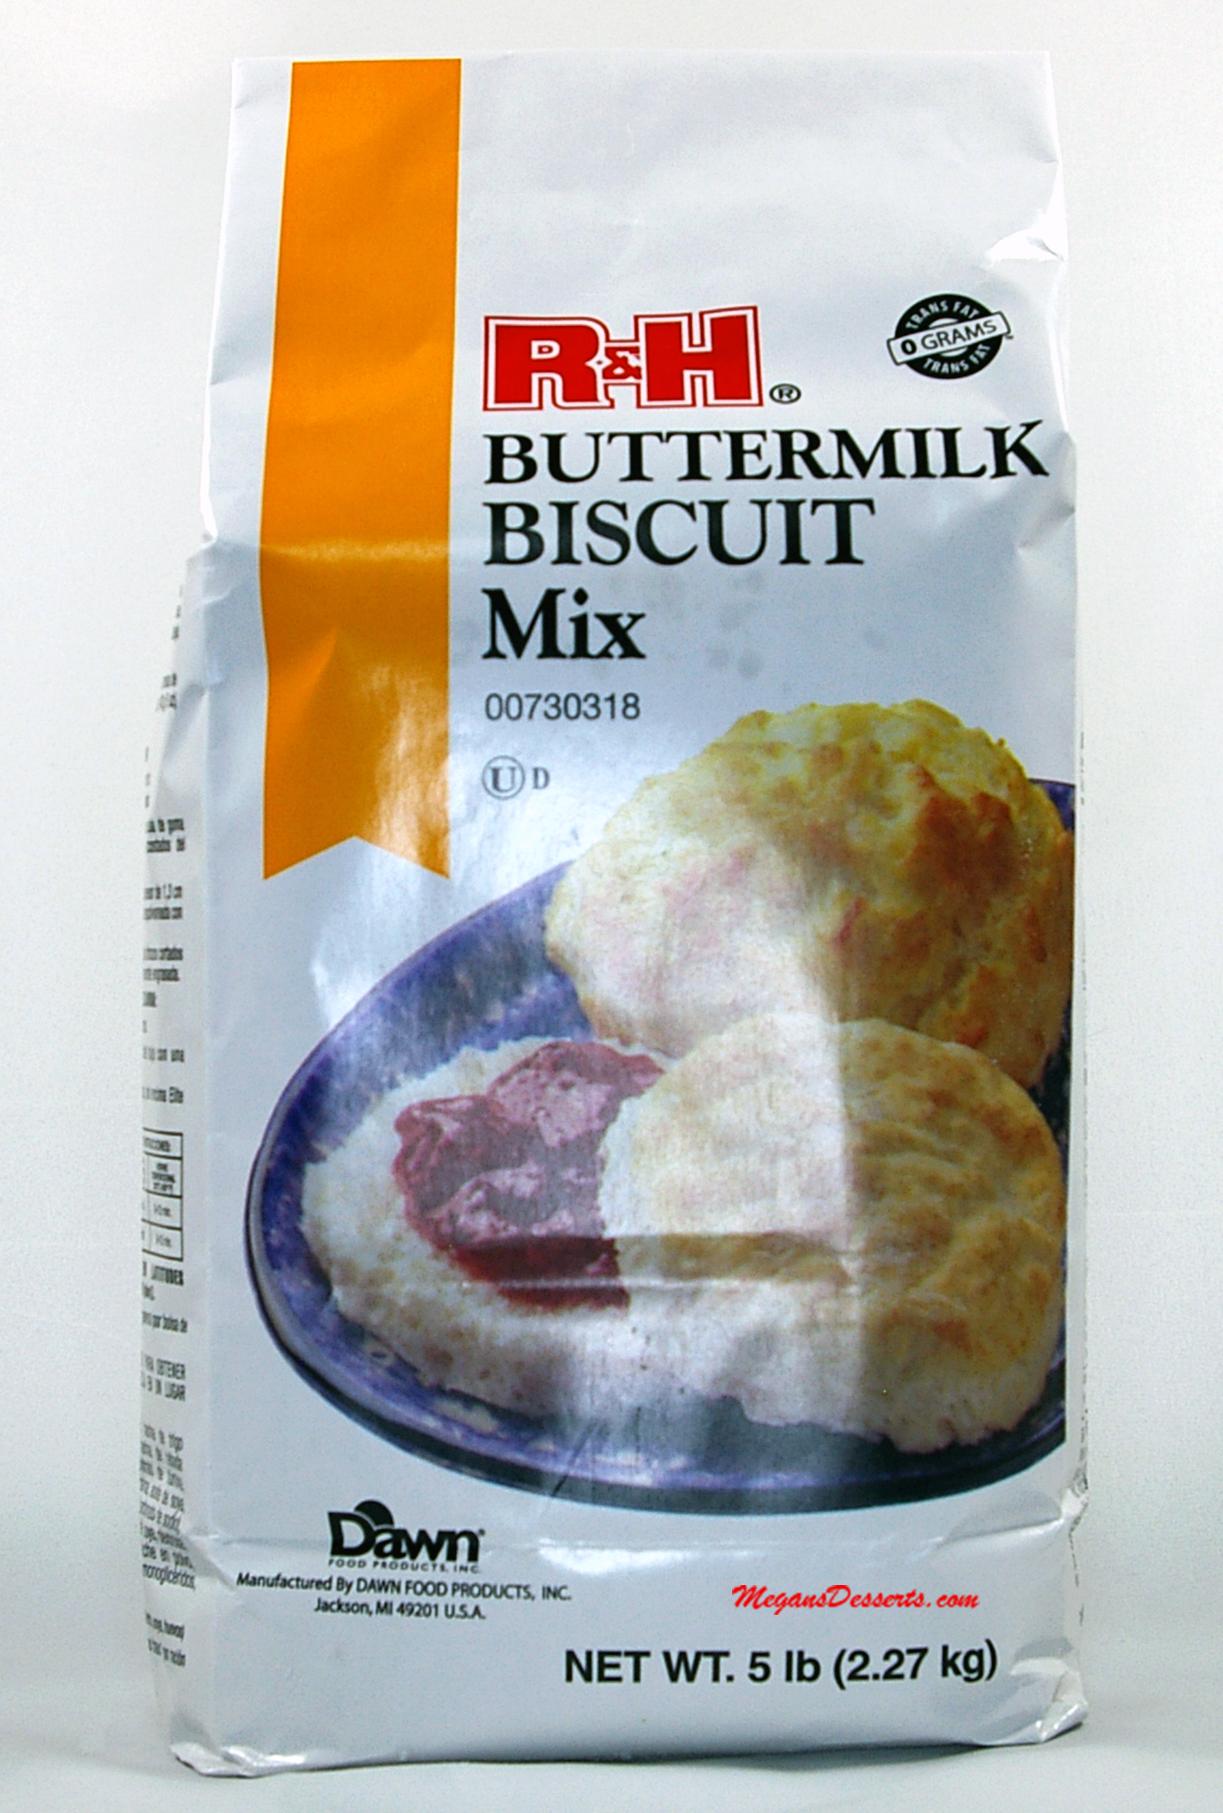 dawn_buttermilk_biscuit_mix_5_large